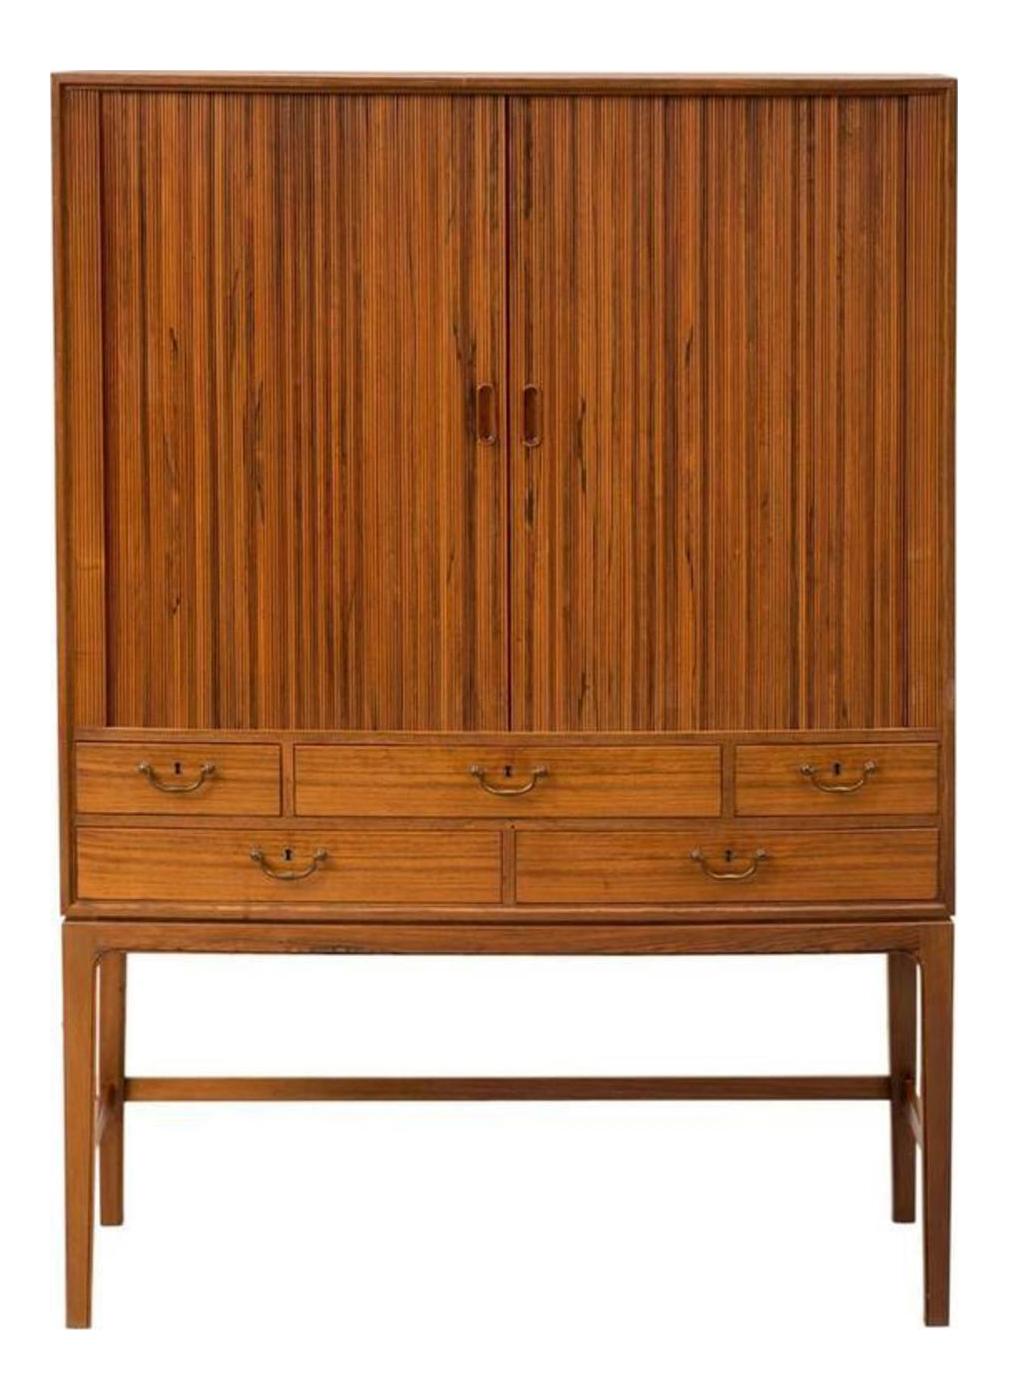 Gentil Ole Wanscher Tambour Cabinet For Sale